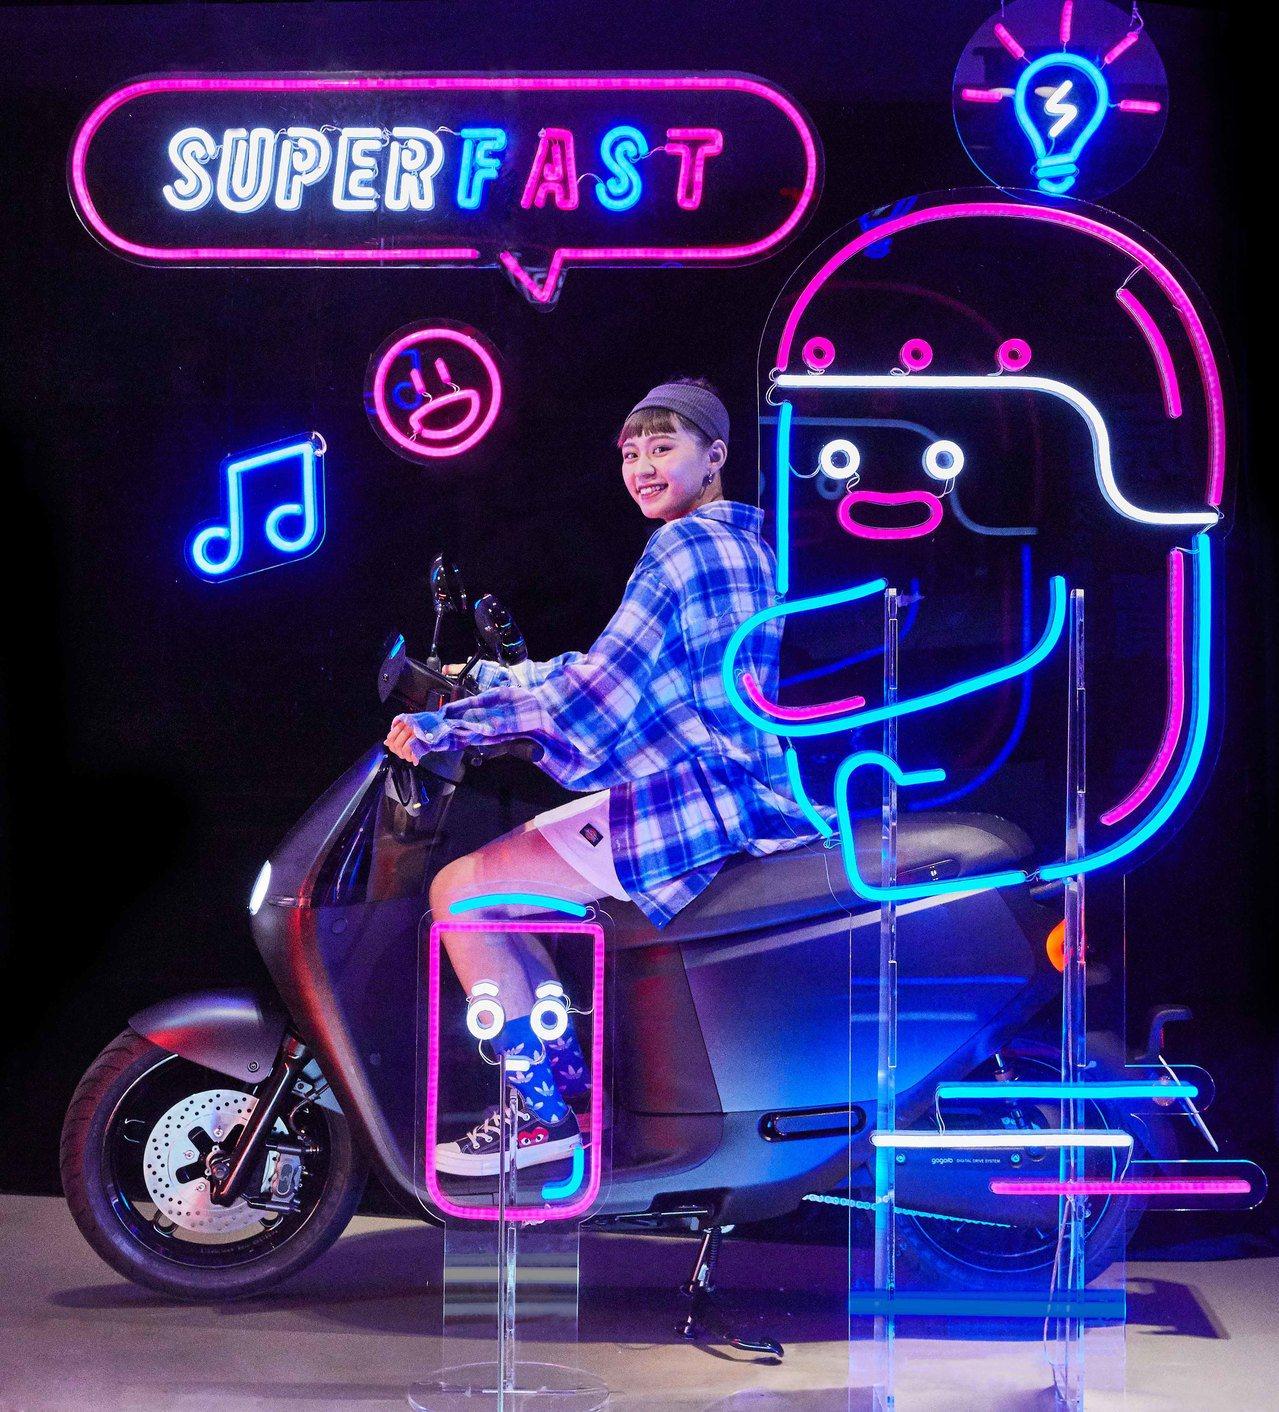 Gogoro 推出以「Gogoro 新朋友」為主題的光采霓虹藝術櫥窗,包含電池小...